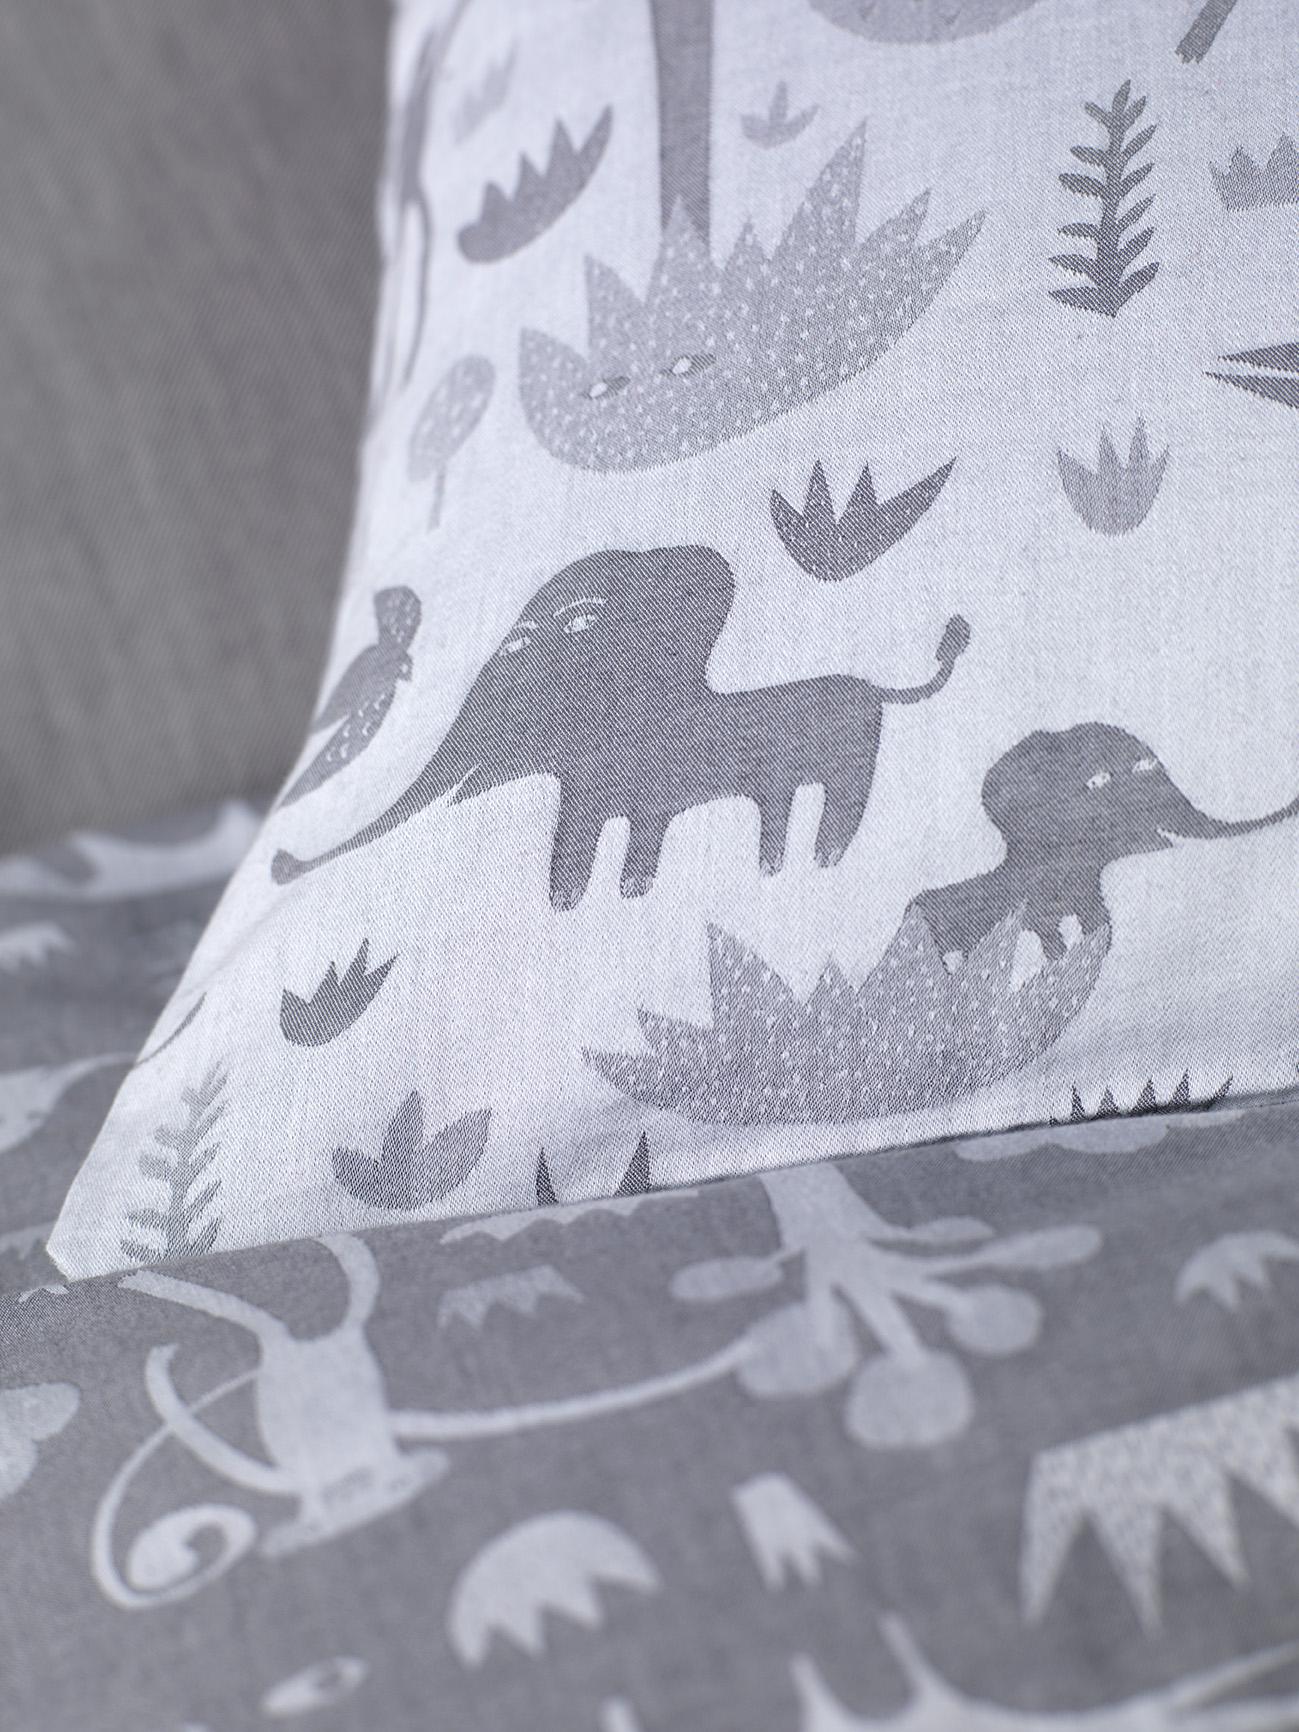 Donna Wilson Collaboration for Secret Linen Store, Menagerie Bed Linen, Detail, single duvet and pillowcase set £59